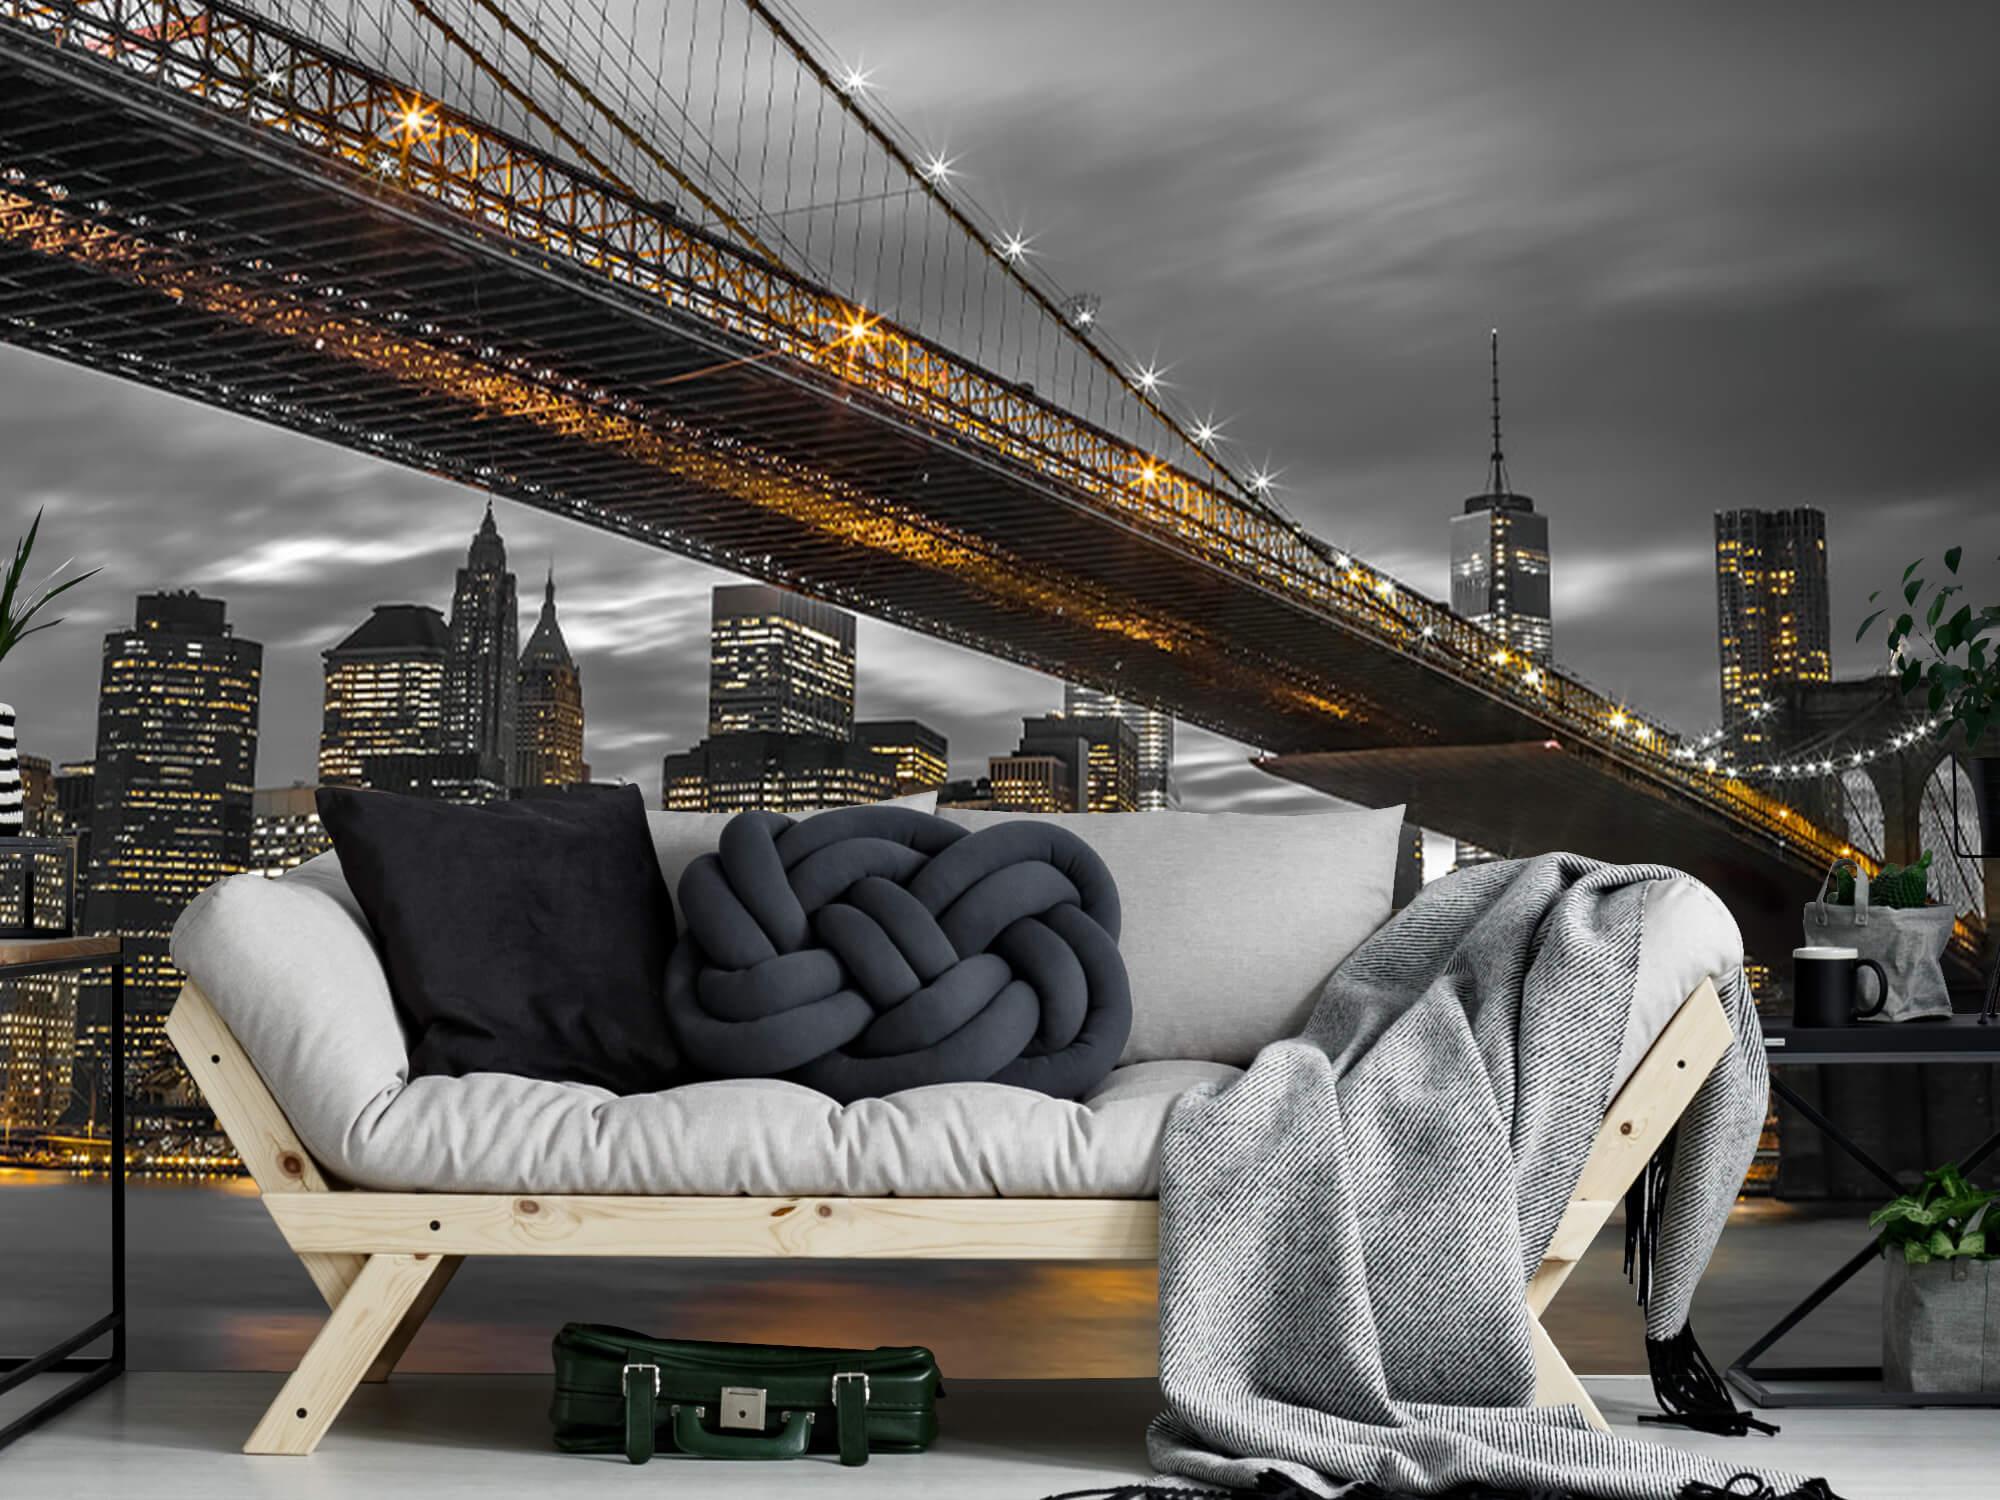 Brooklyn Bridge, New York 10